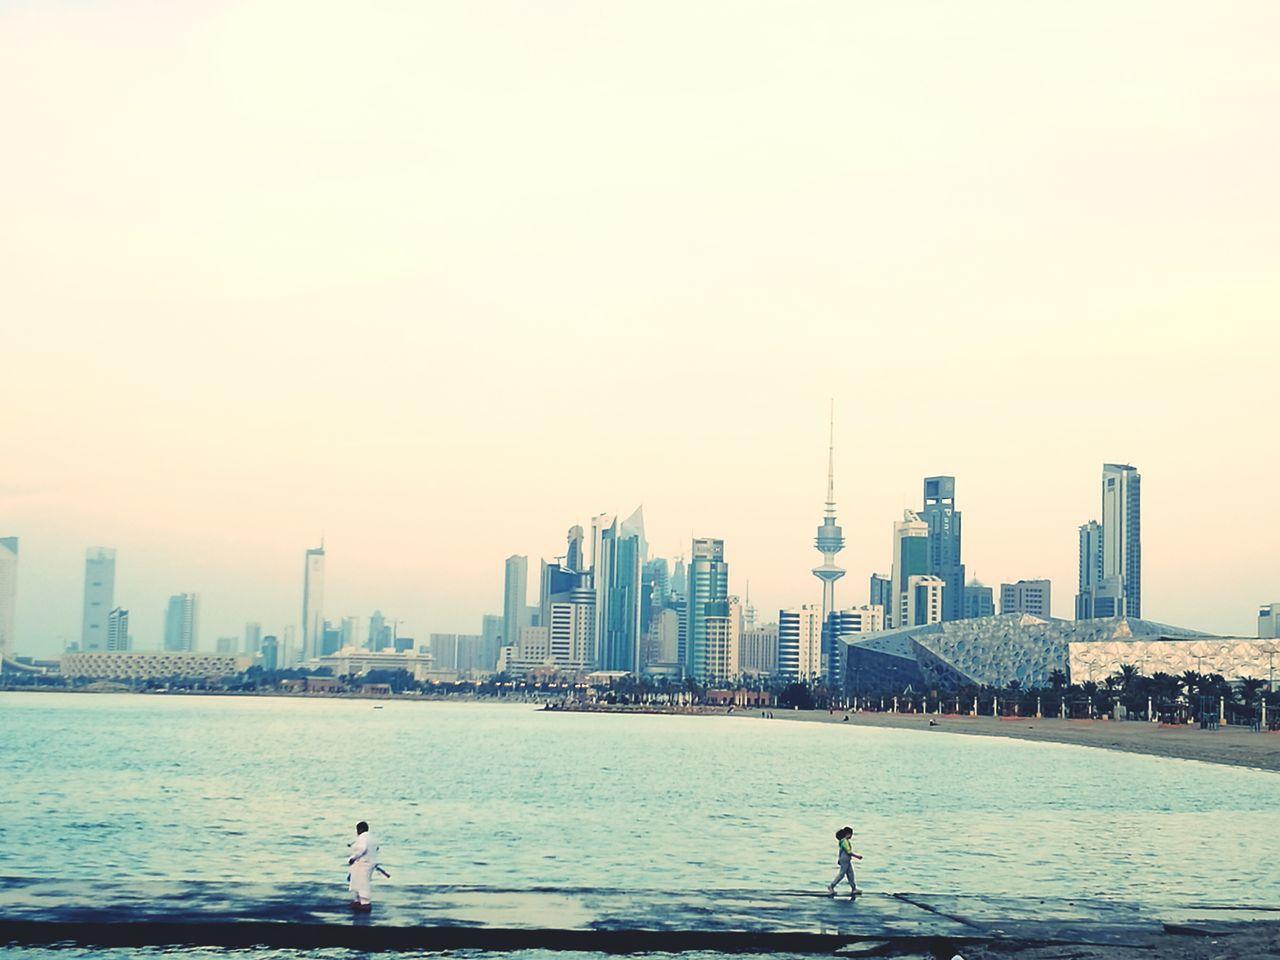 Skyscraper City Cityscape Outdoors Water Sky Sea Travel Destinations Cloud - Sky Kuwait Kuwait City